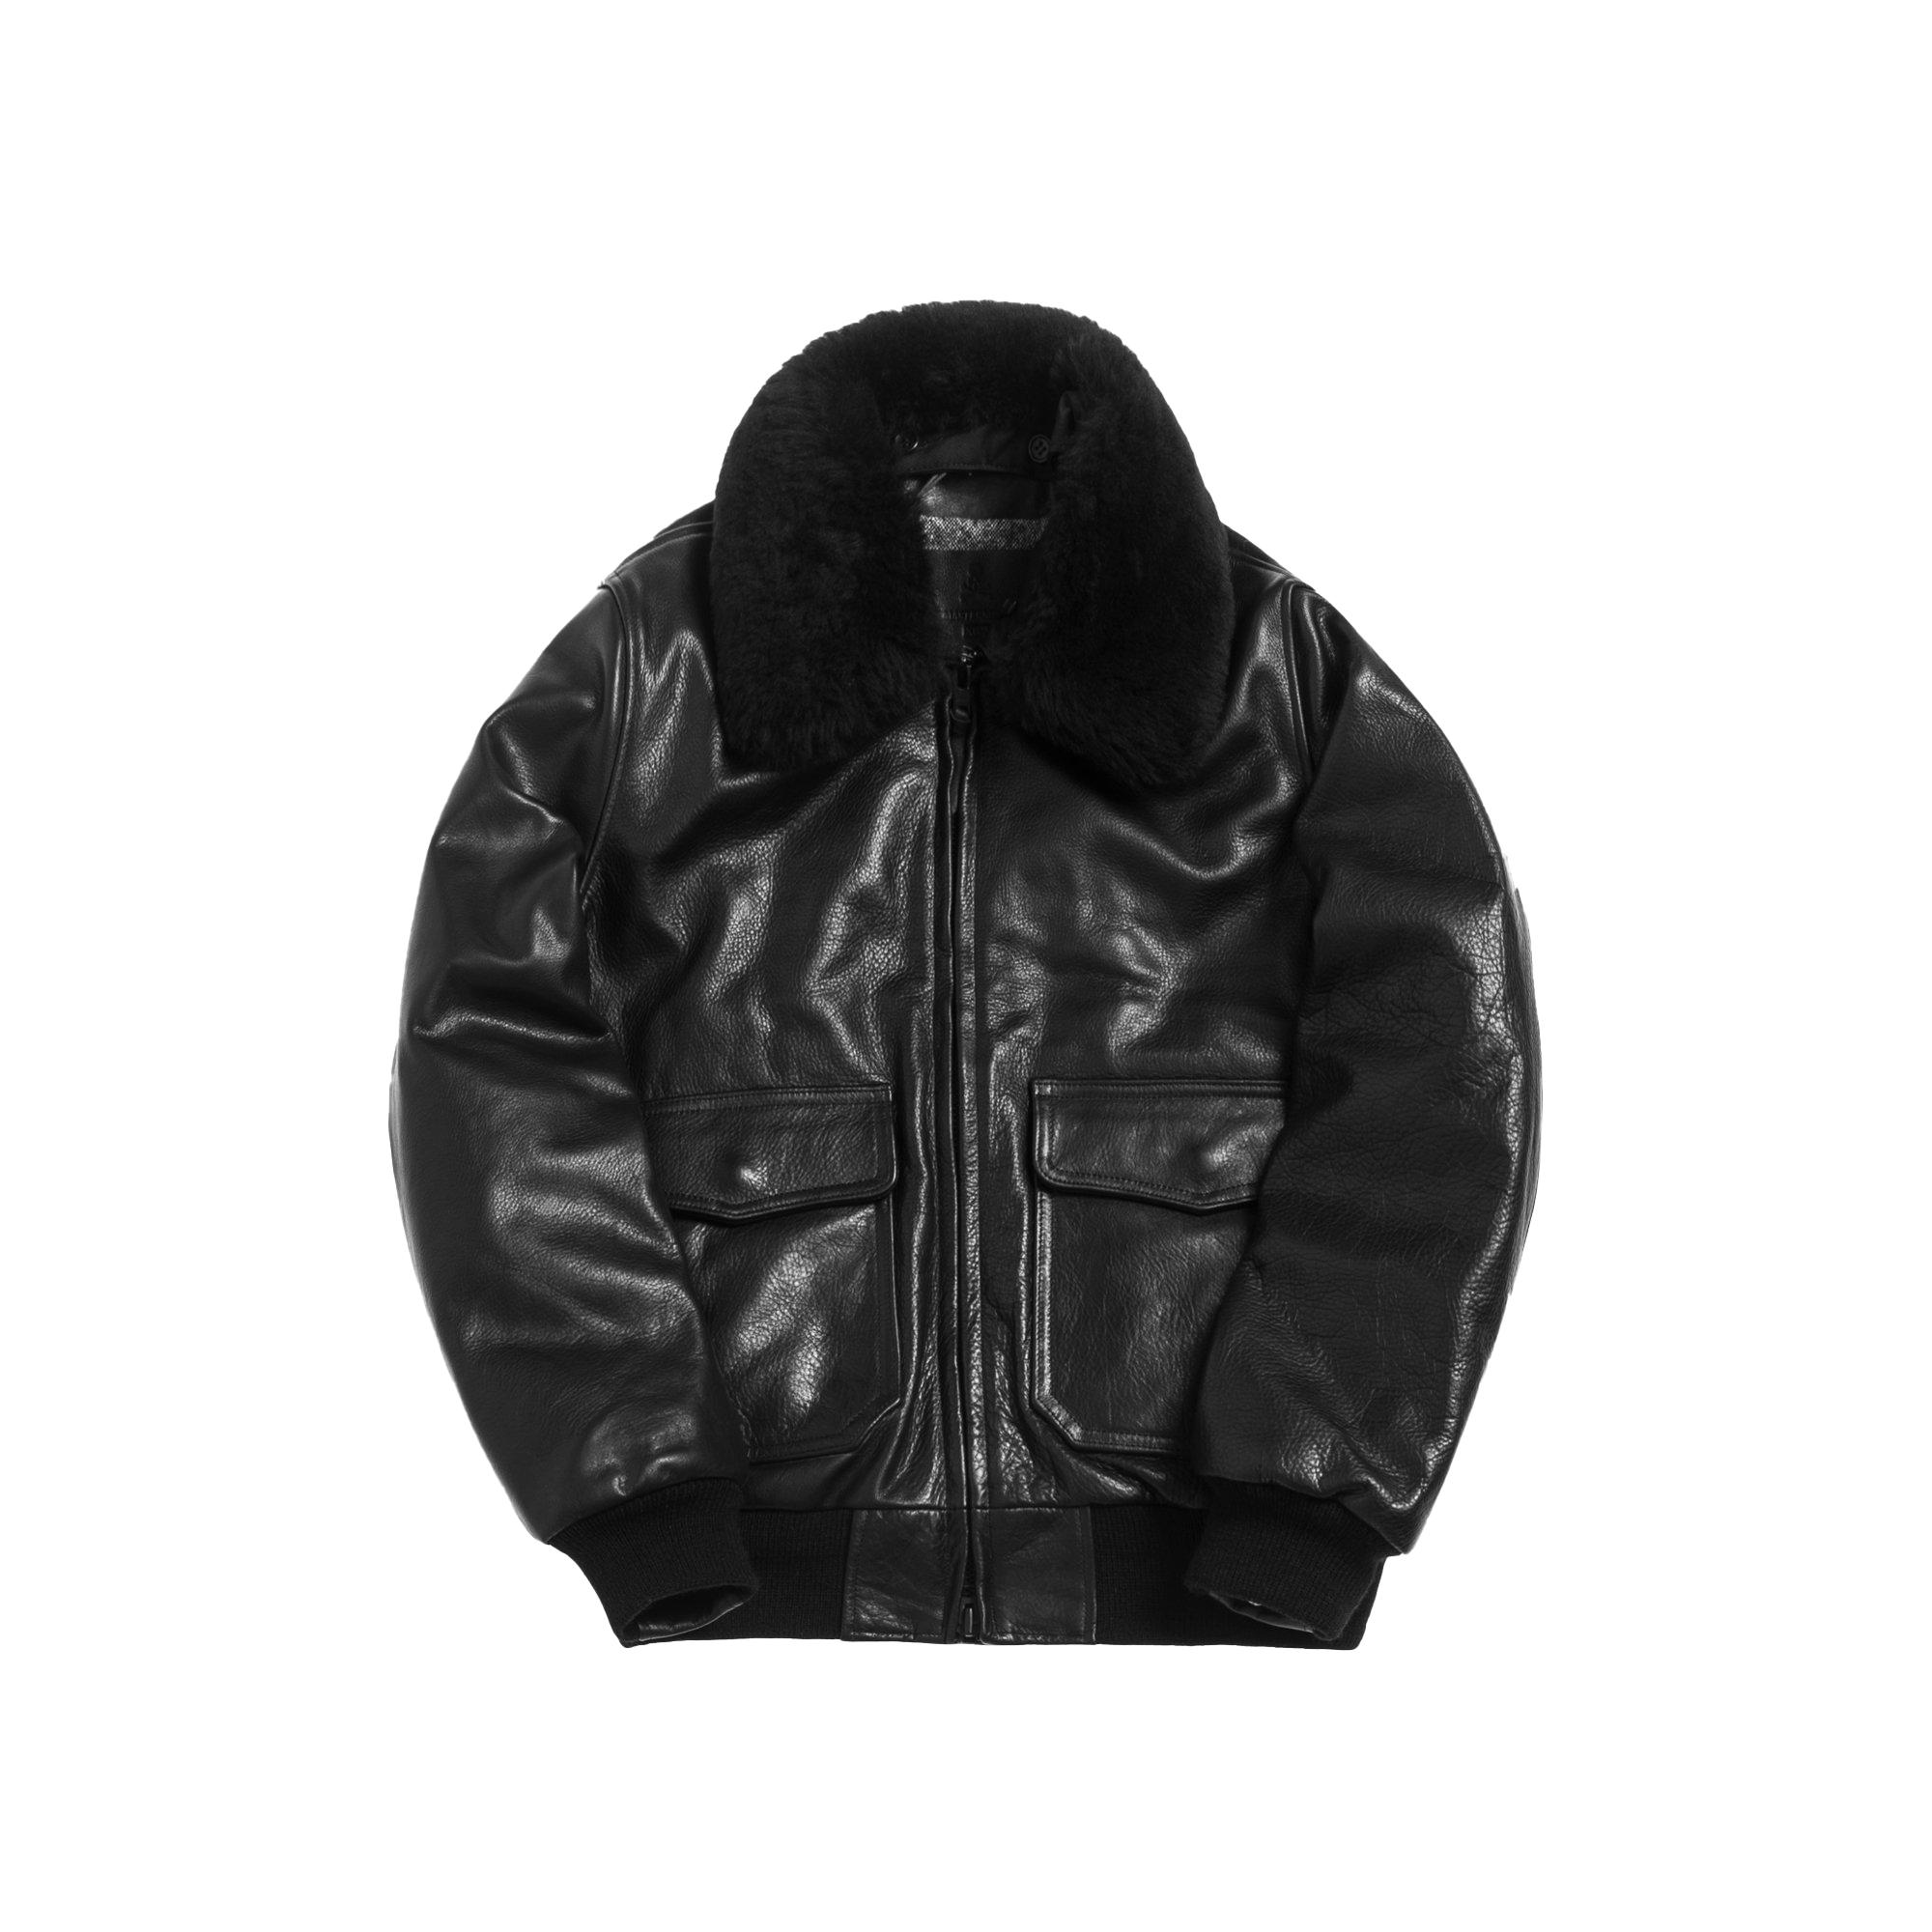 Kith x mastermind WORLD x Golden Bear Bomber Jacket Black